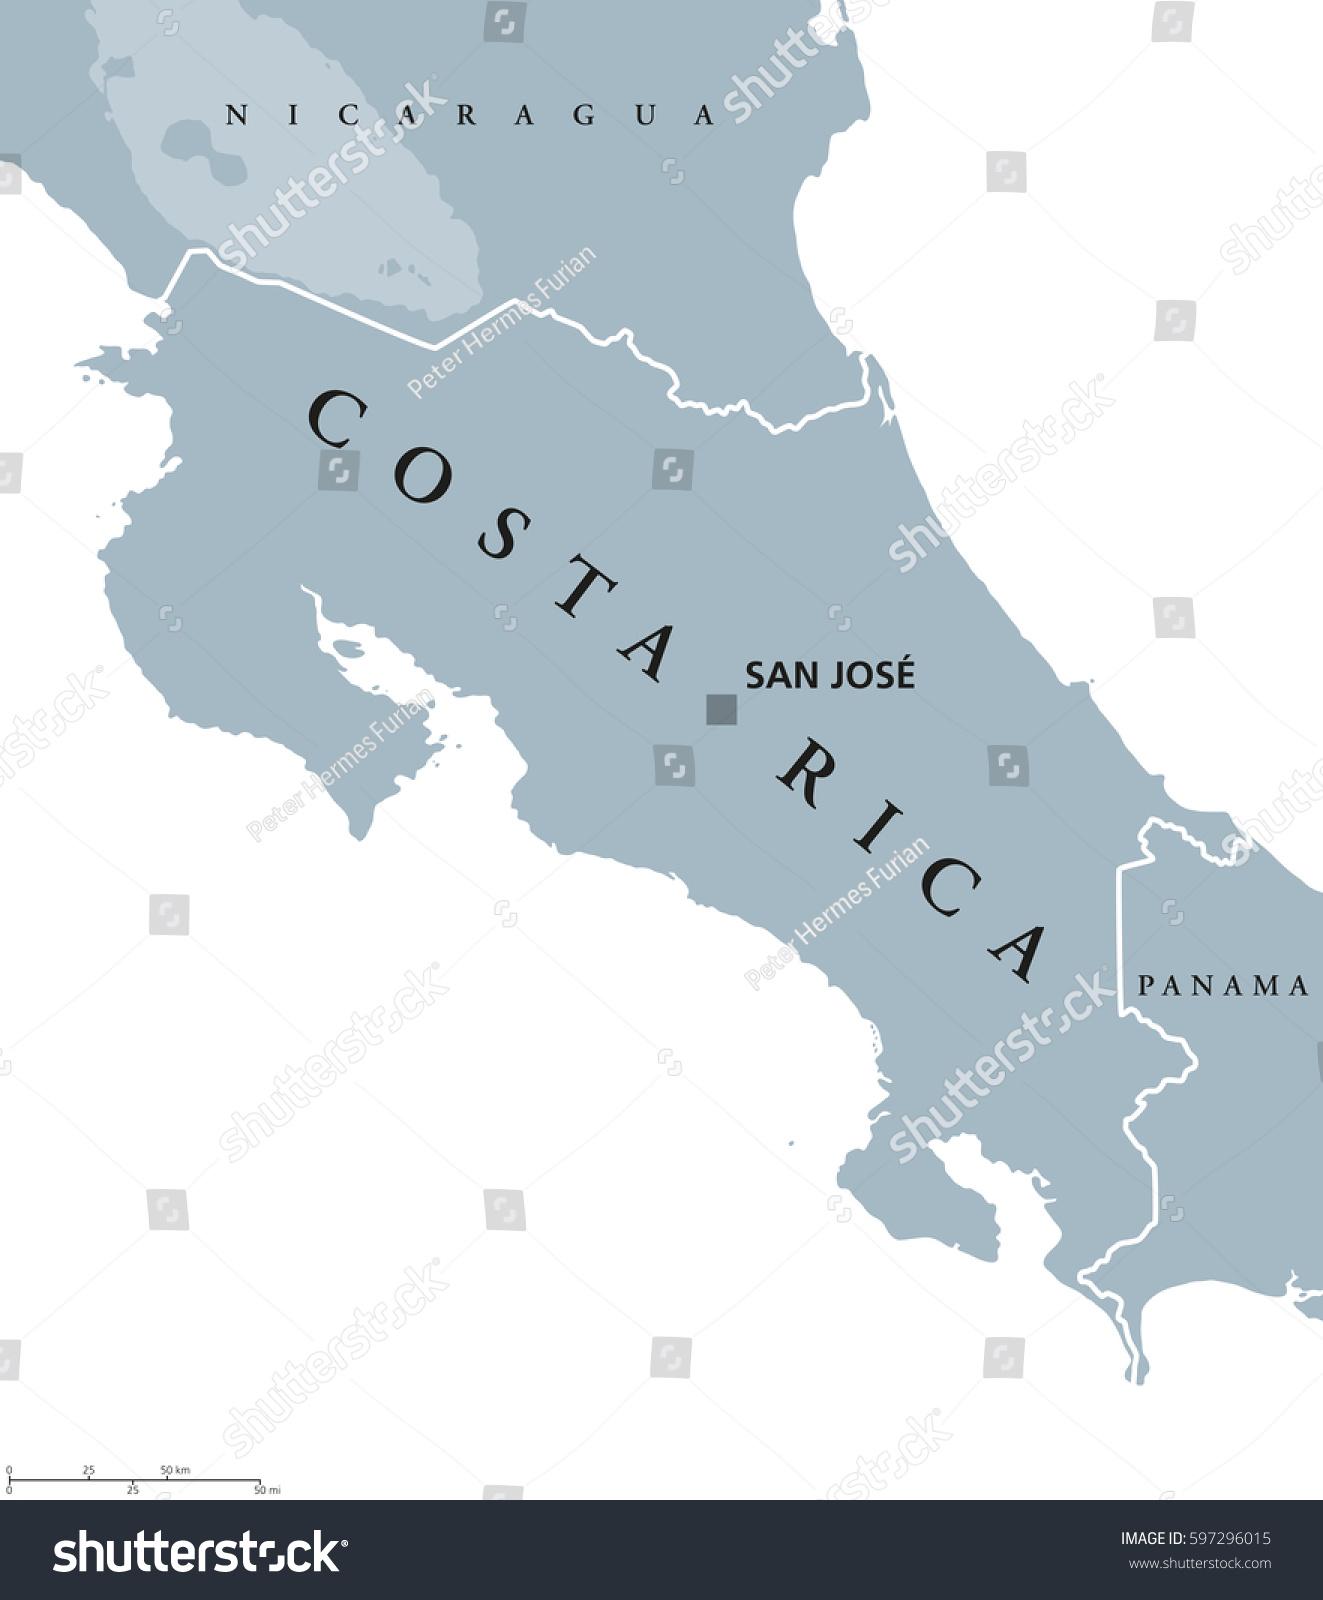 Costa rica political map capital san stock vector 597296015 costa rica political map capital san stock vector 597296015 shutterstock gumiabroncs Gallery